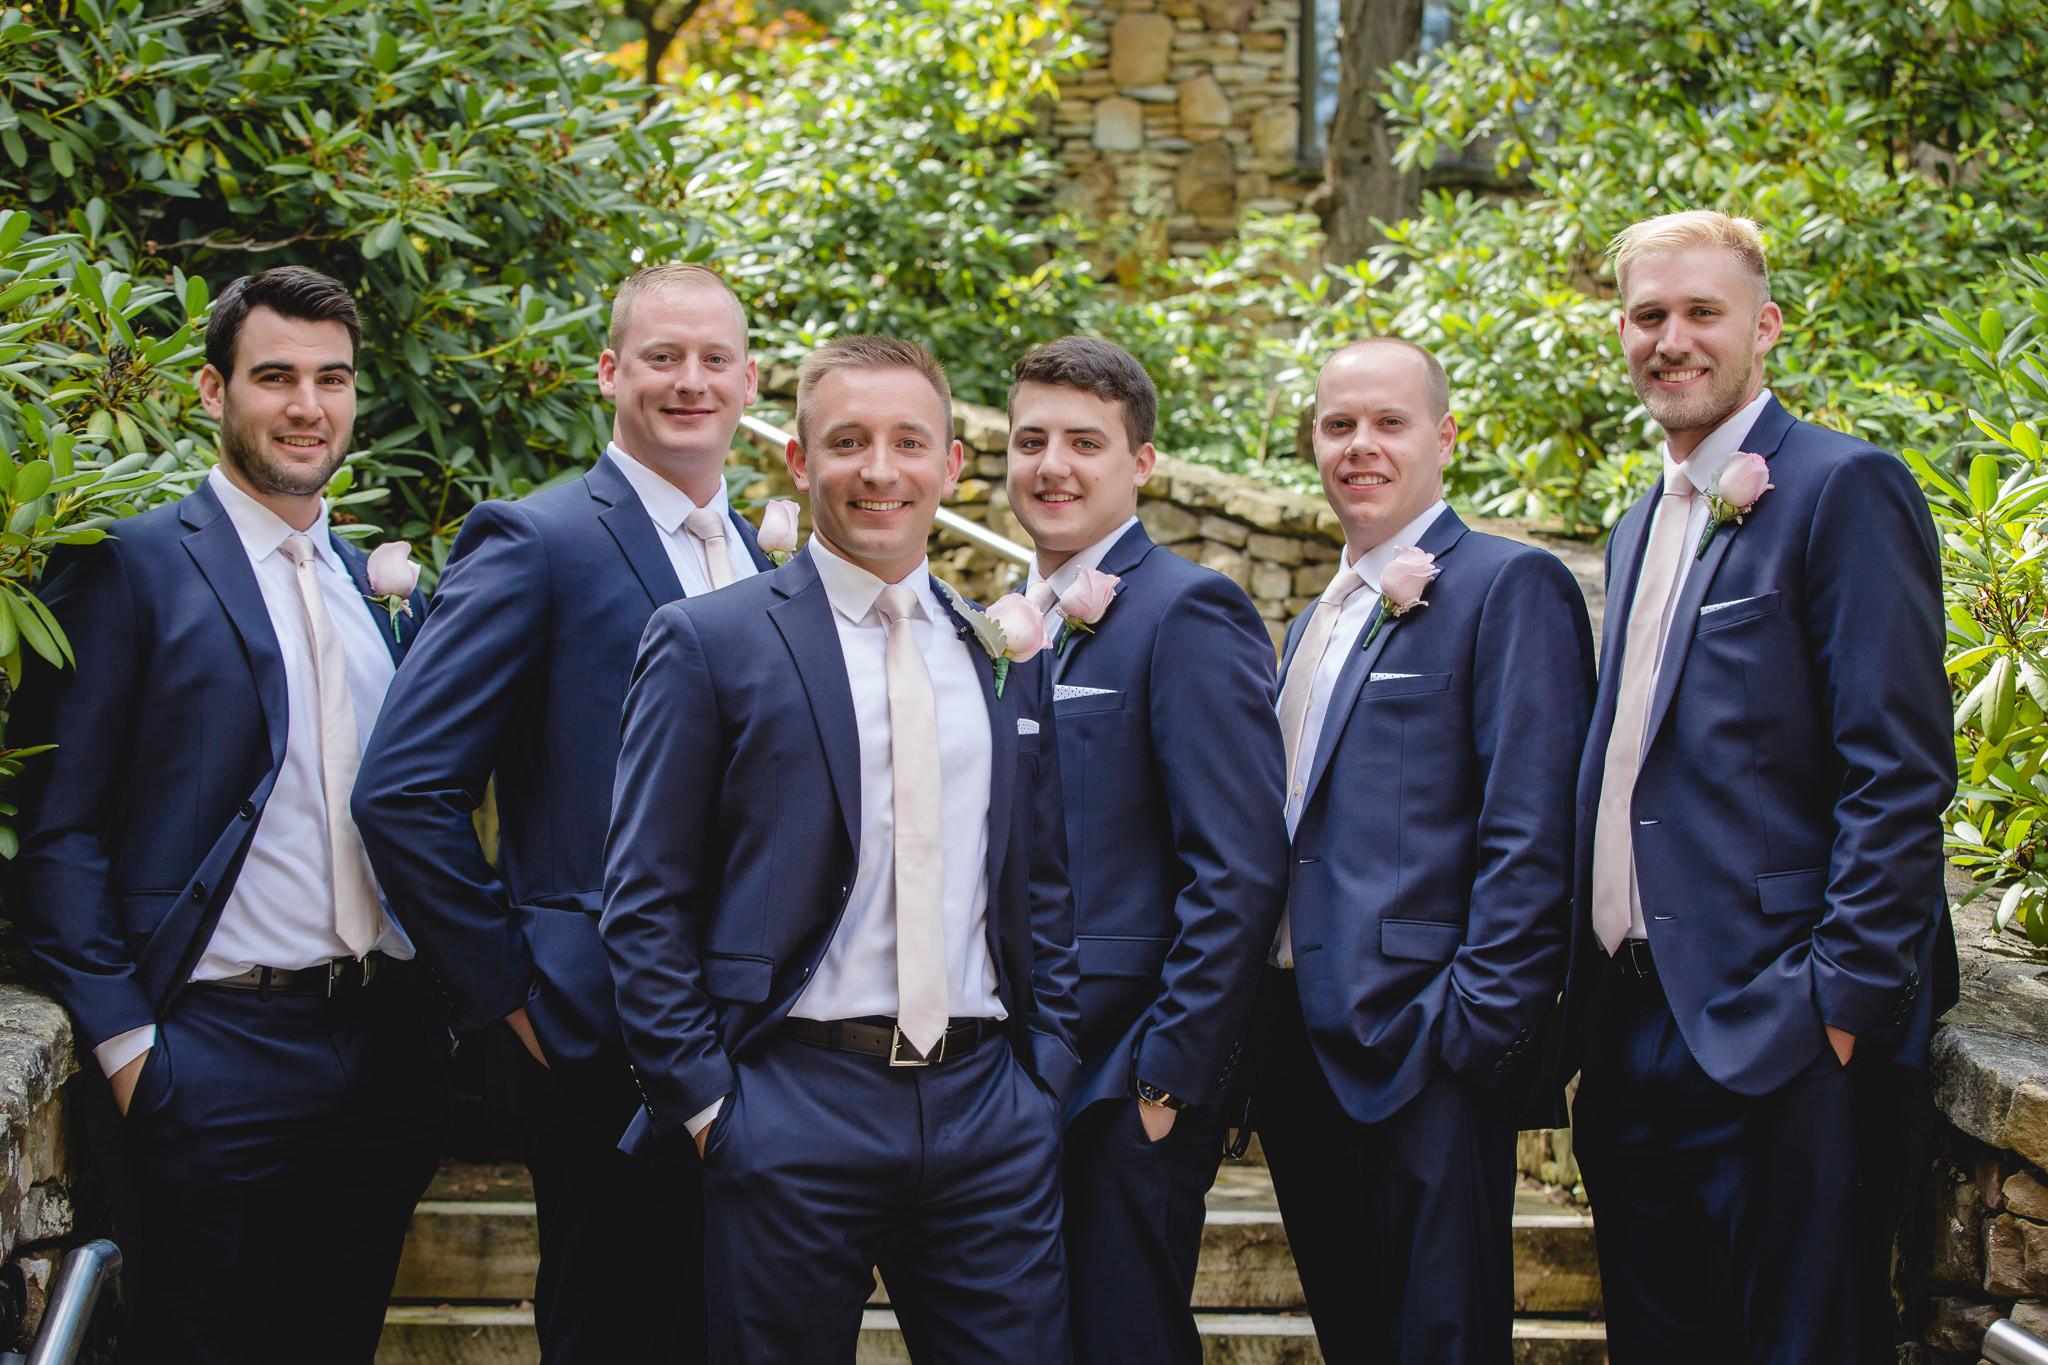 Groom poses with his groomsmen at Hidden Valley Resort